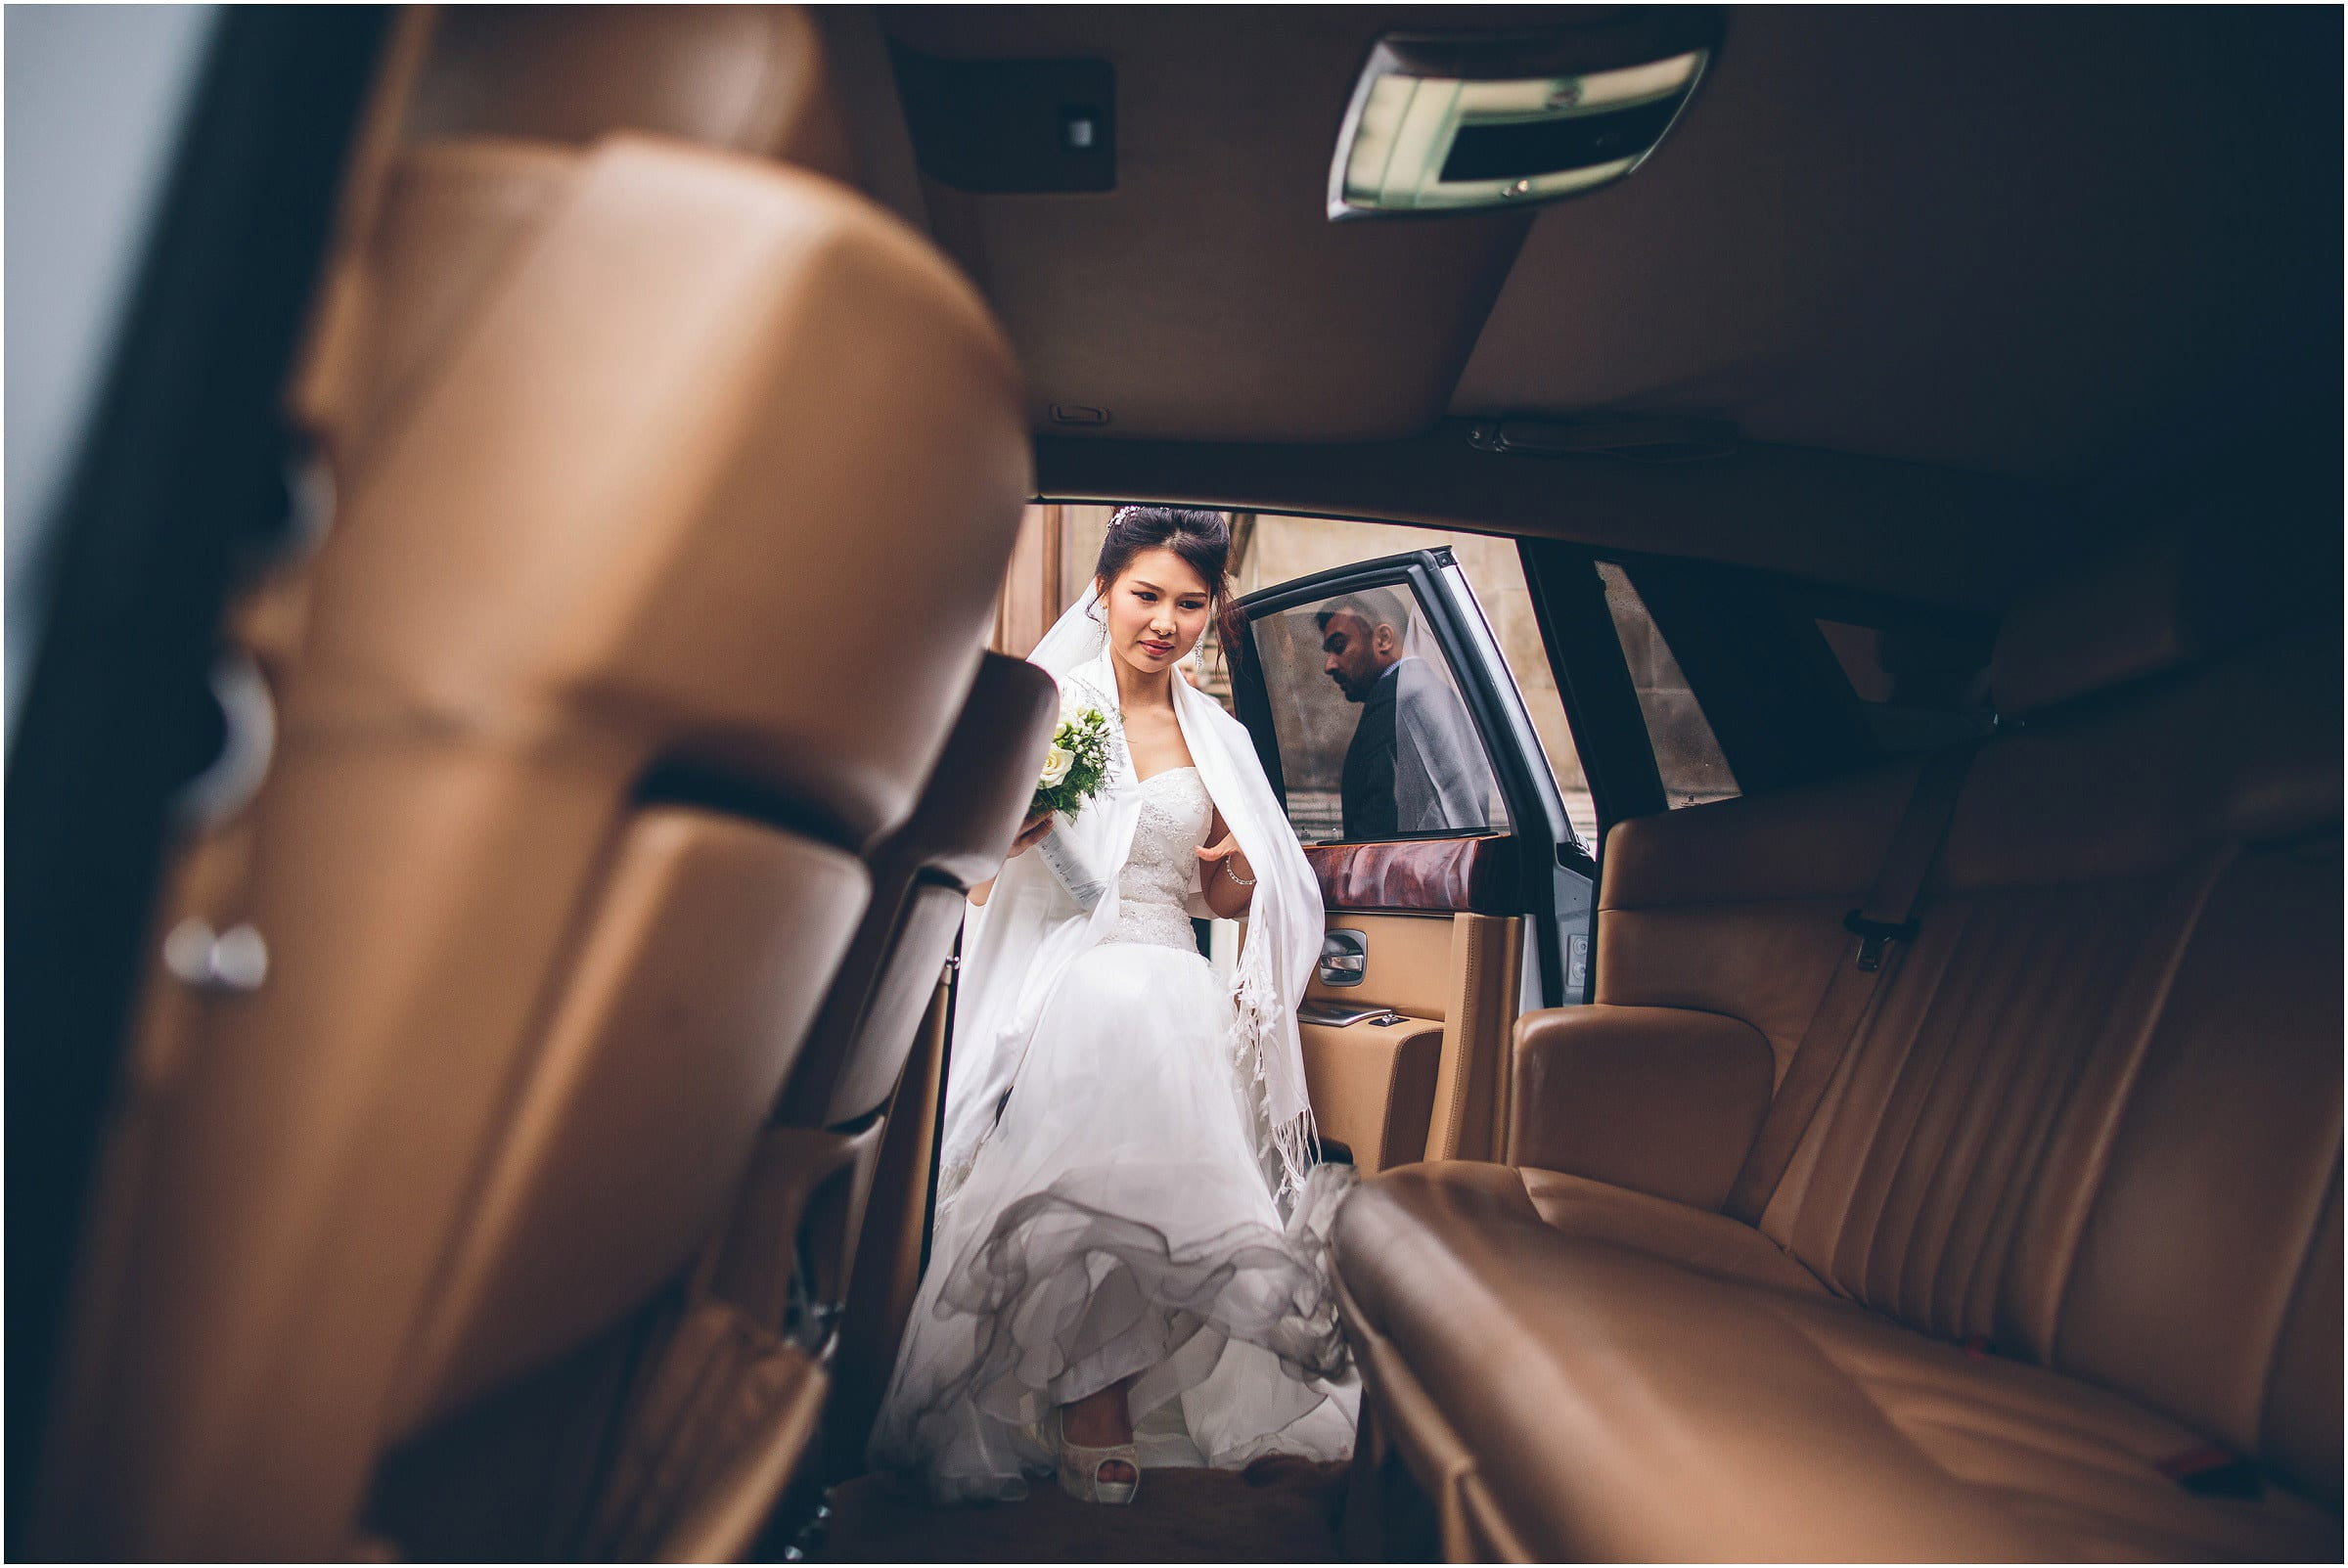 Royal_Horseguards_Wedding_Photography_0053